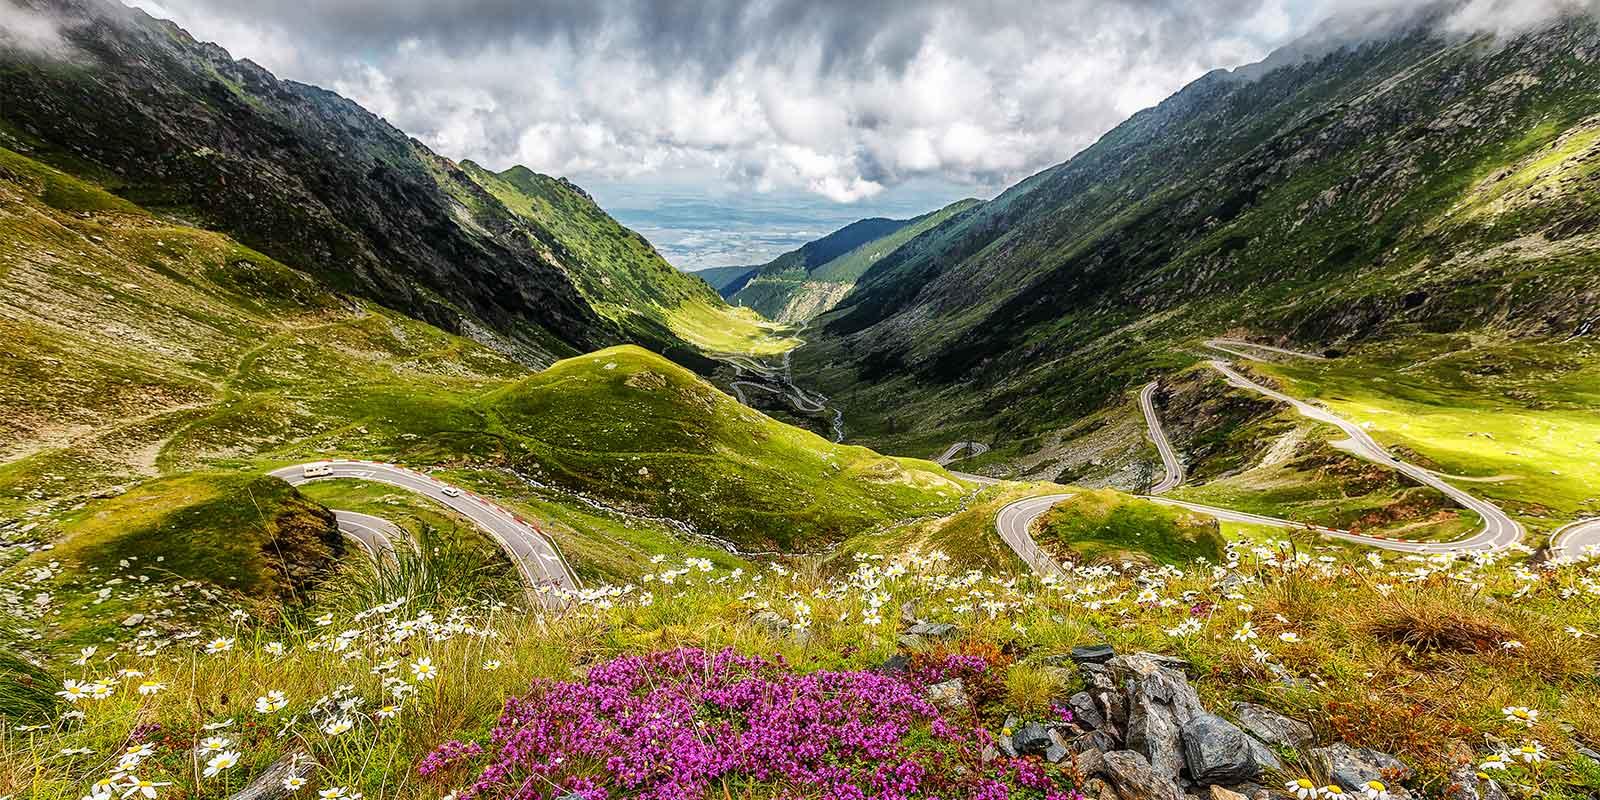 Transfagarasan road in the Carpathian mountains